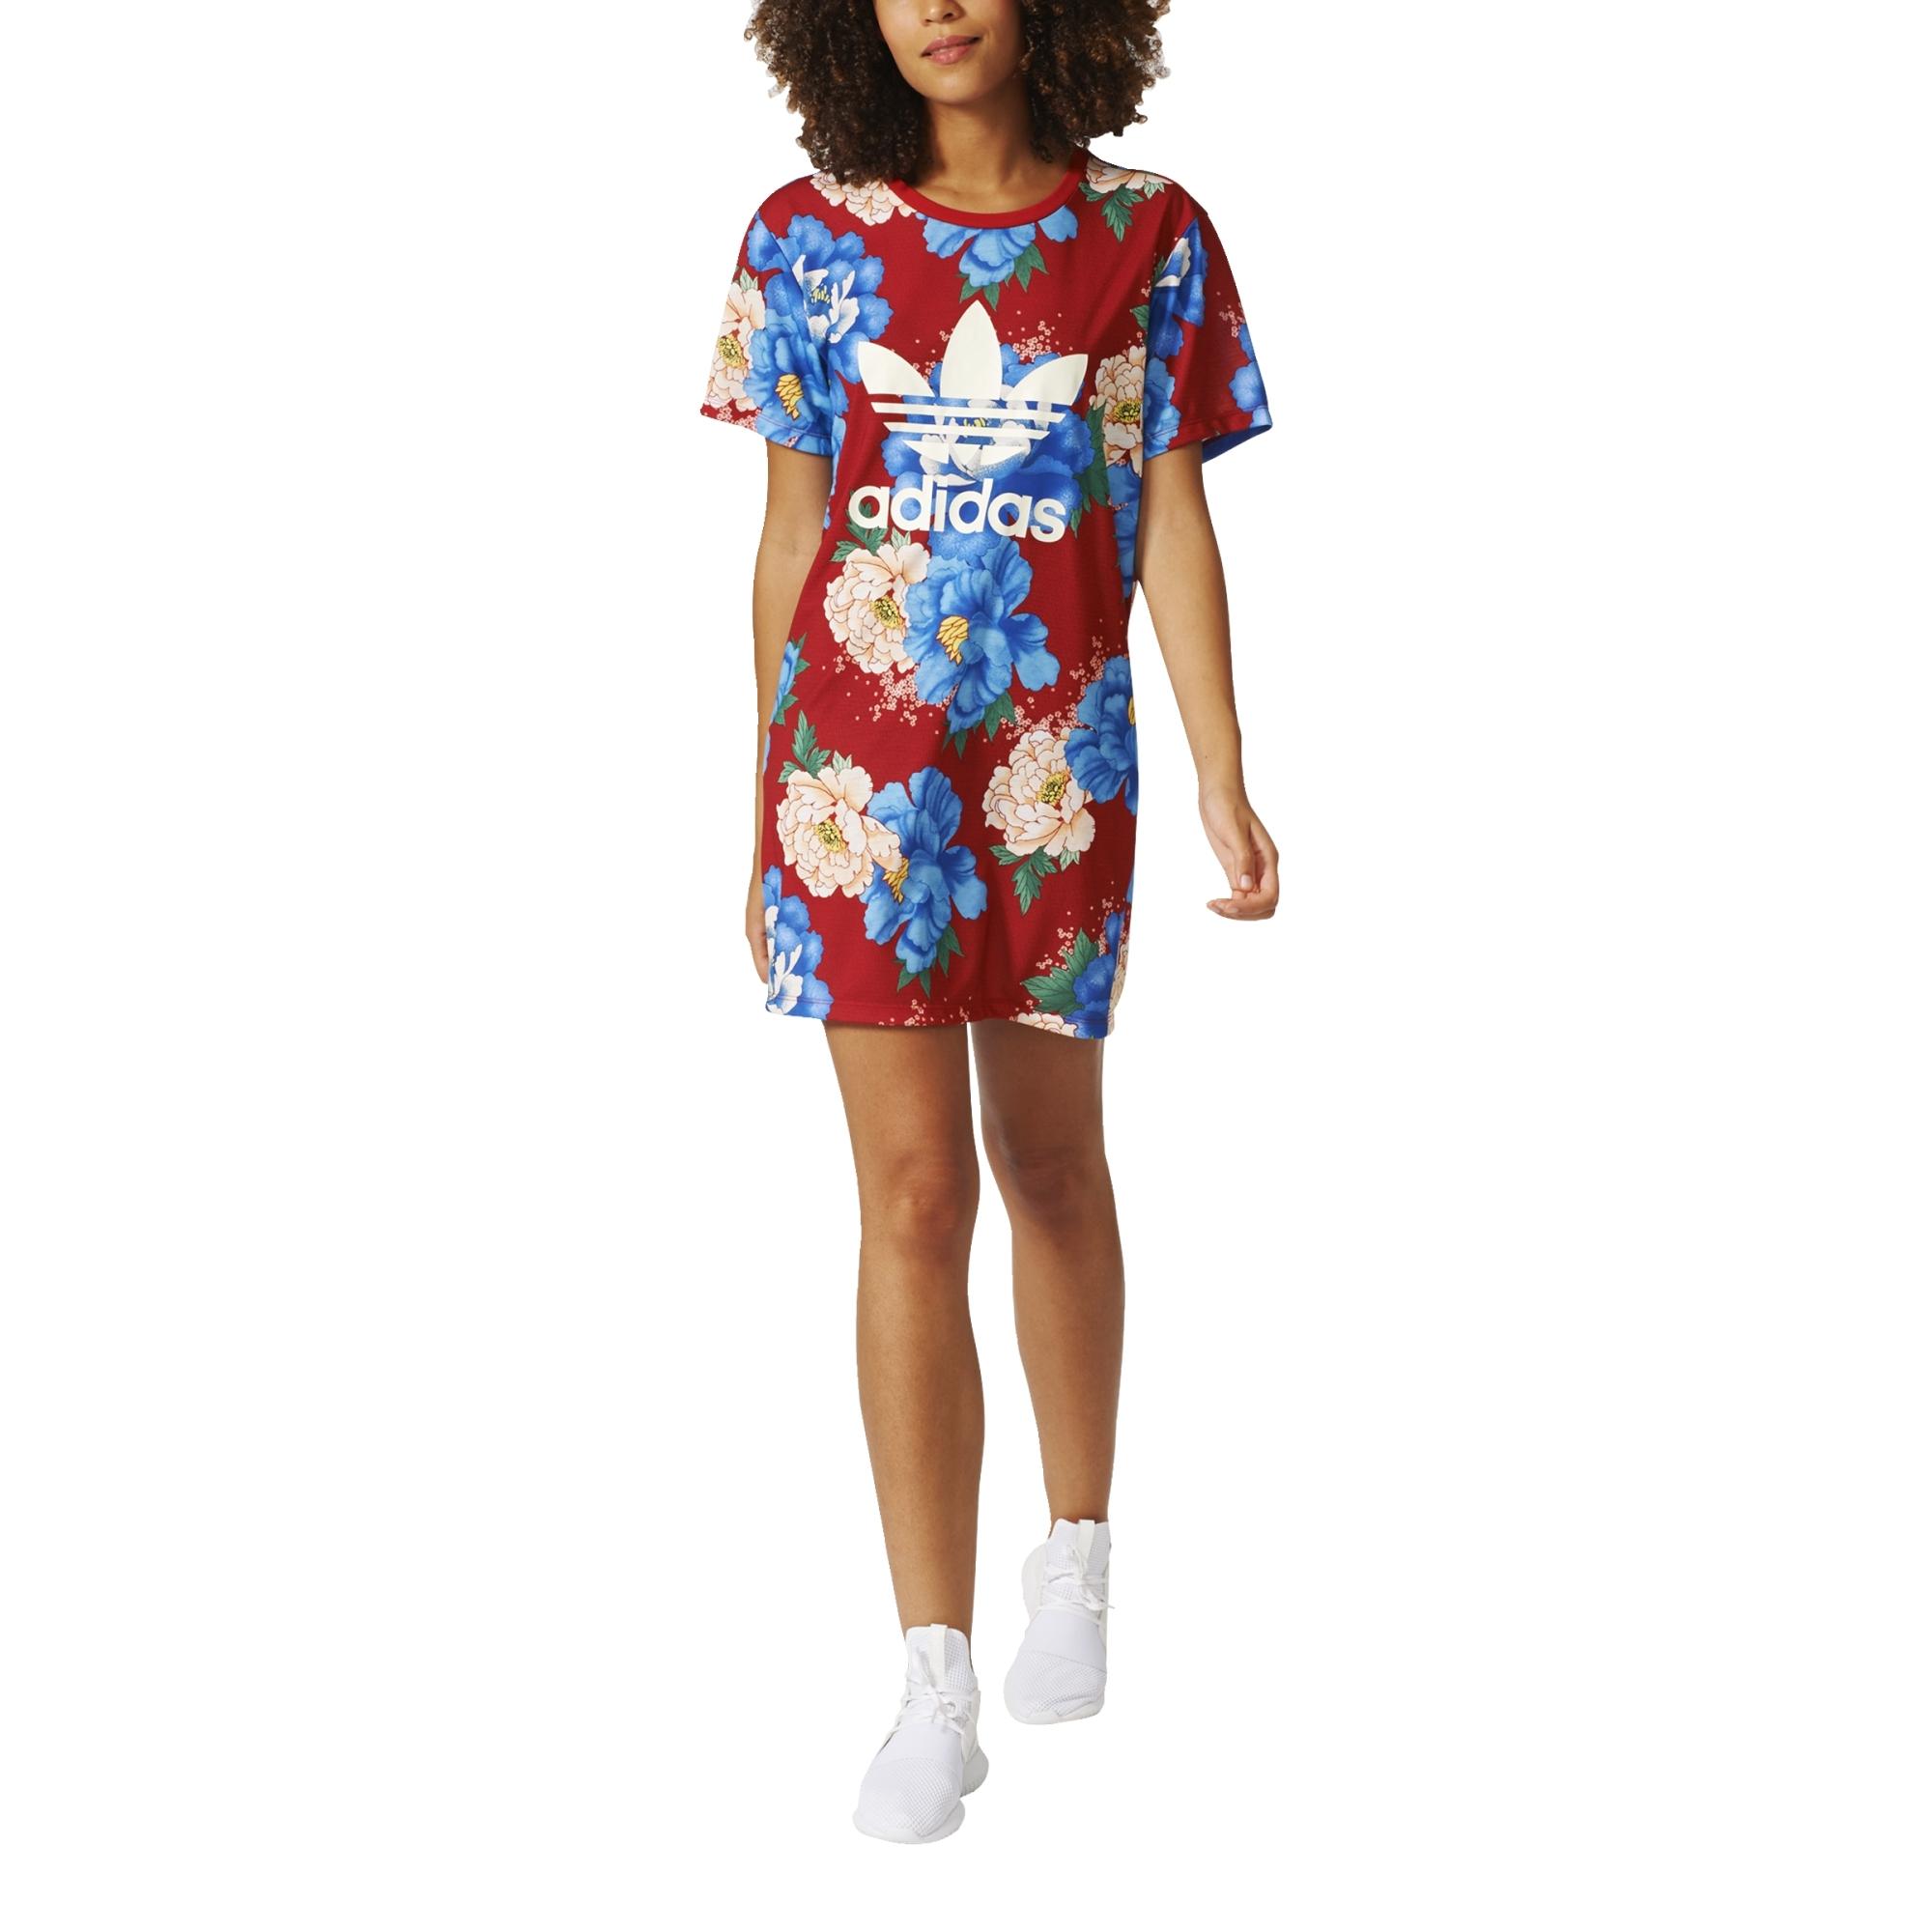 Policía Optimismo Peligro  Adidas Originals Trefoil Tee Dress